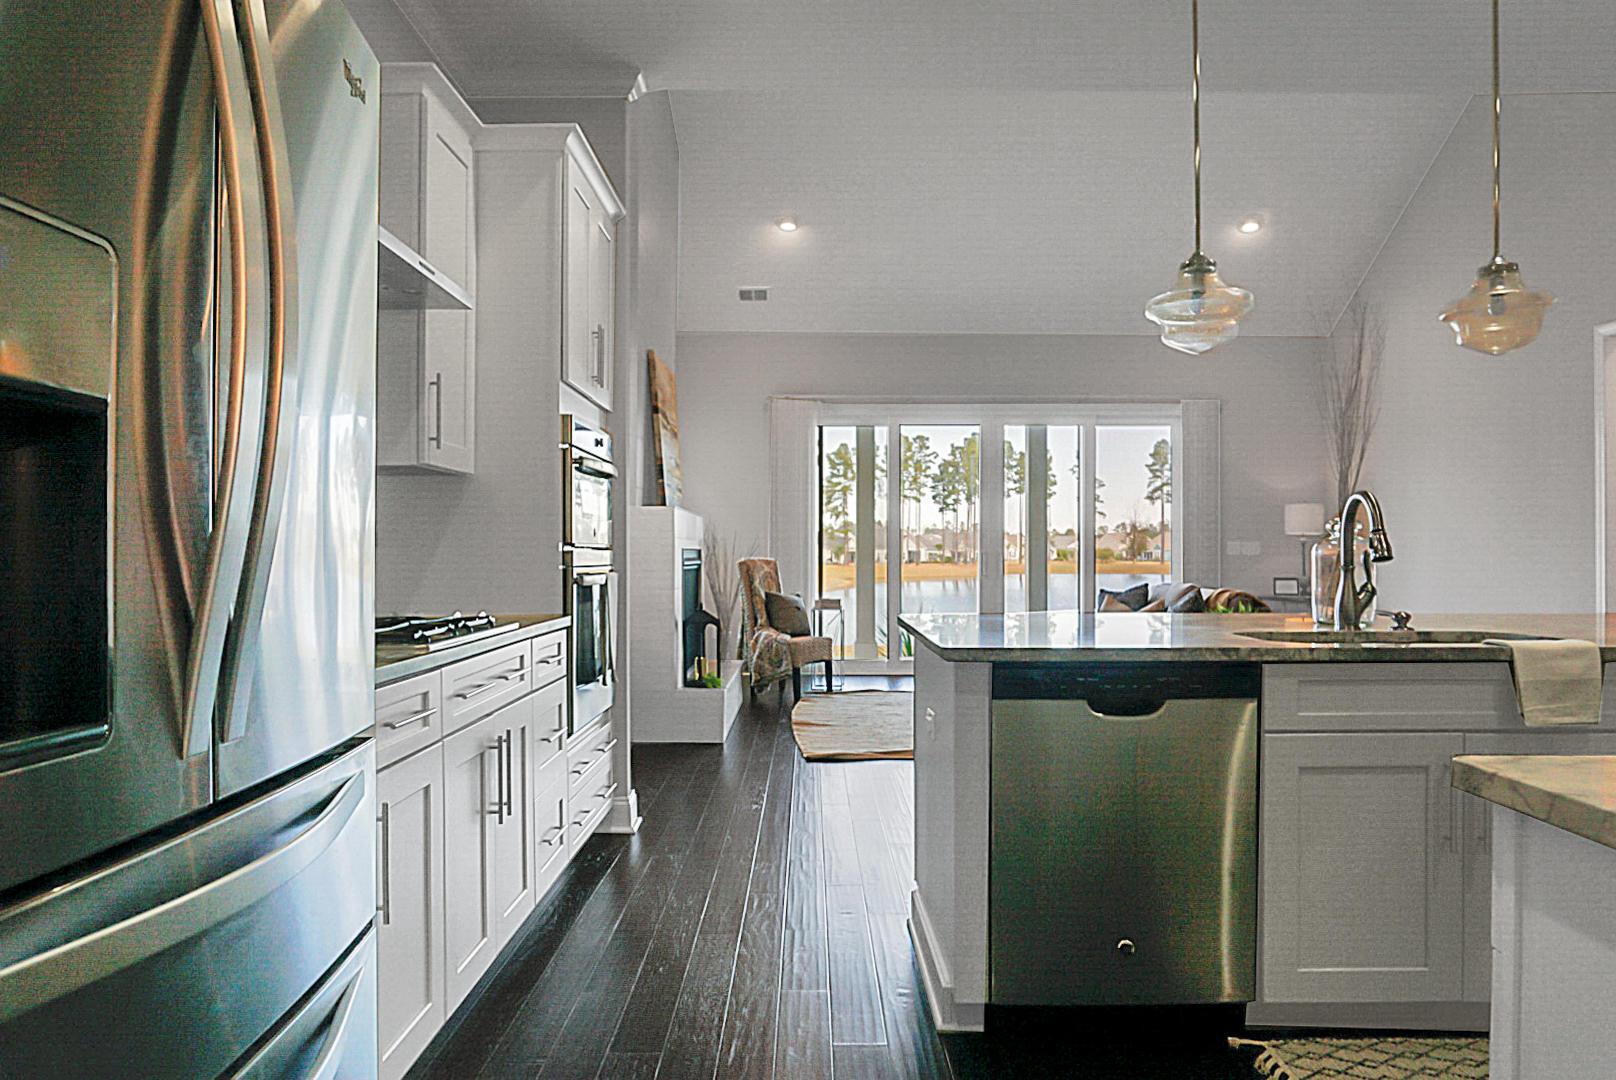 Cane Bay Plantation Homes For Sale - 284 Calm Water, Summerville, SC - 0